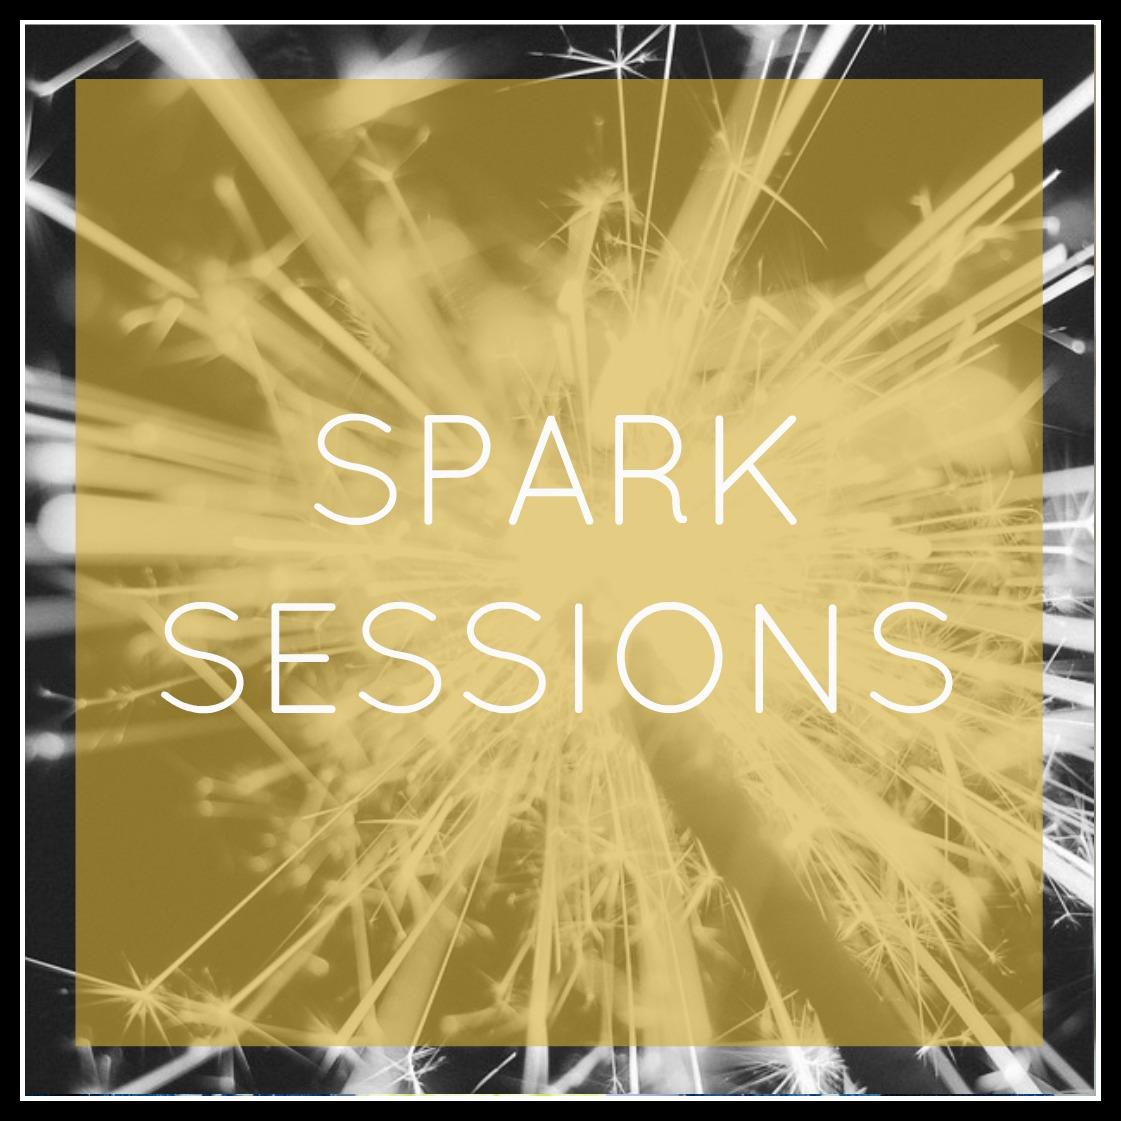 Spark Sessions | Evolve Marketing|Design